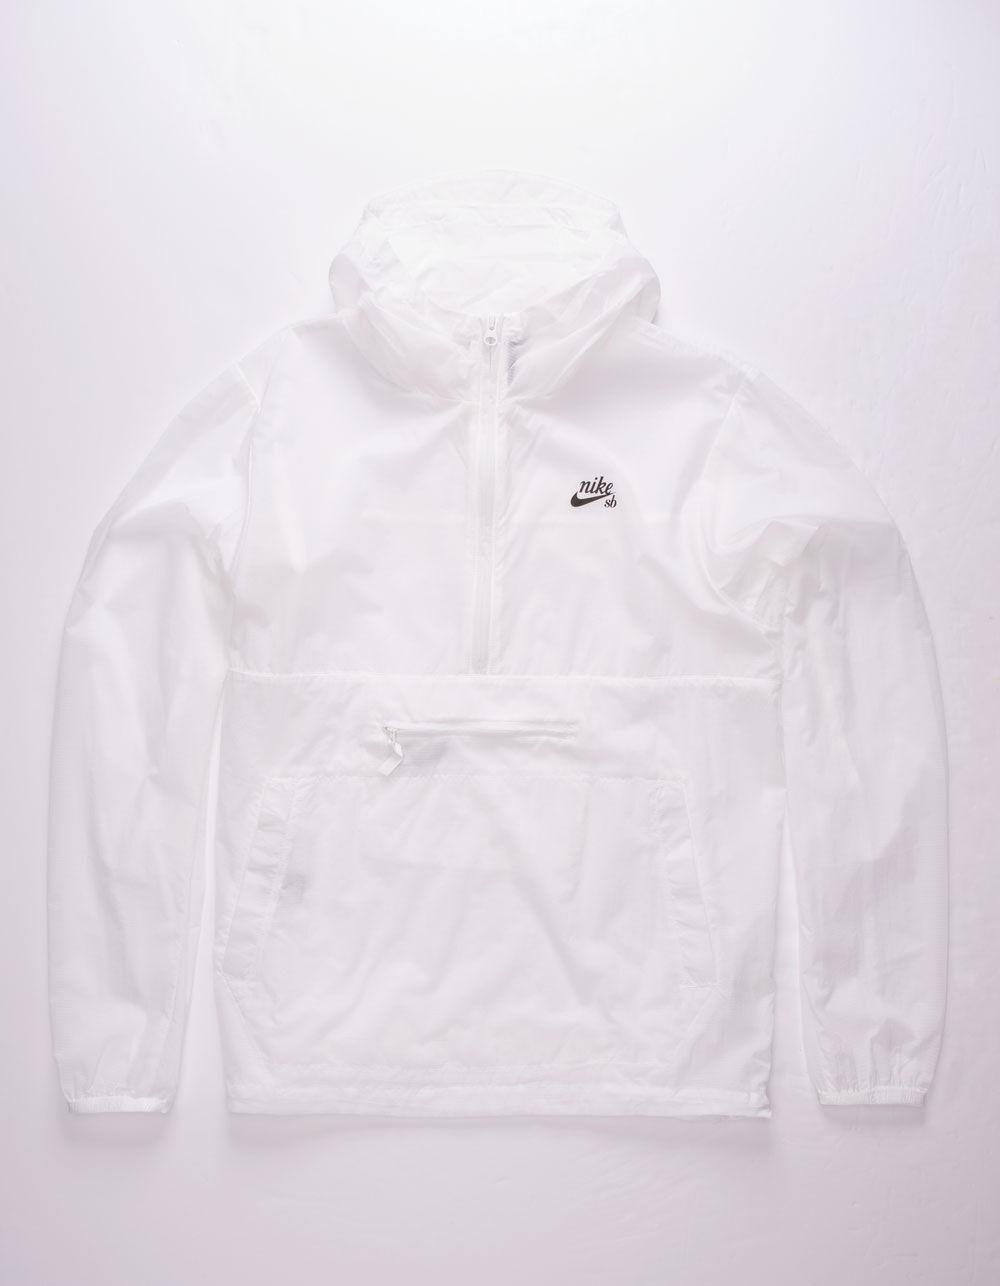 NIKE SB Skate White Anorak Jacket